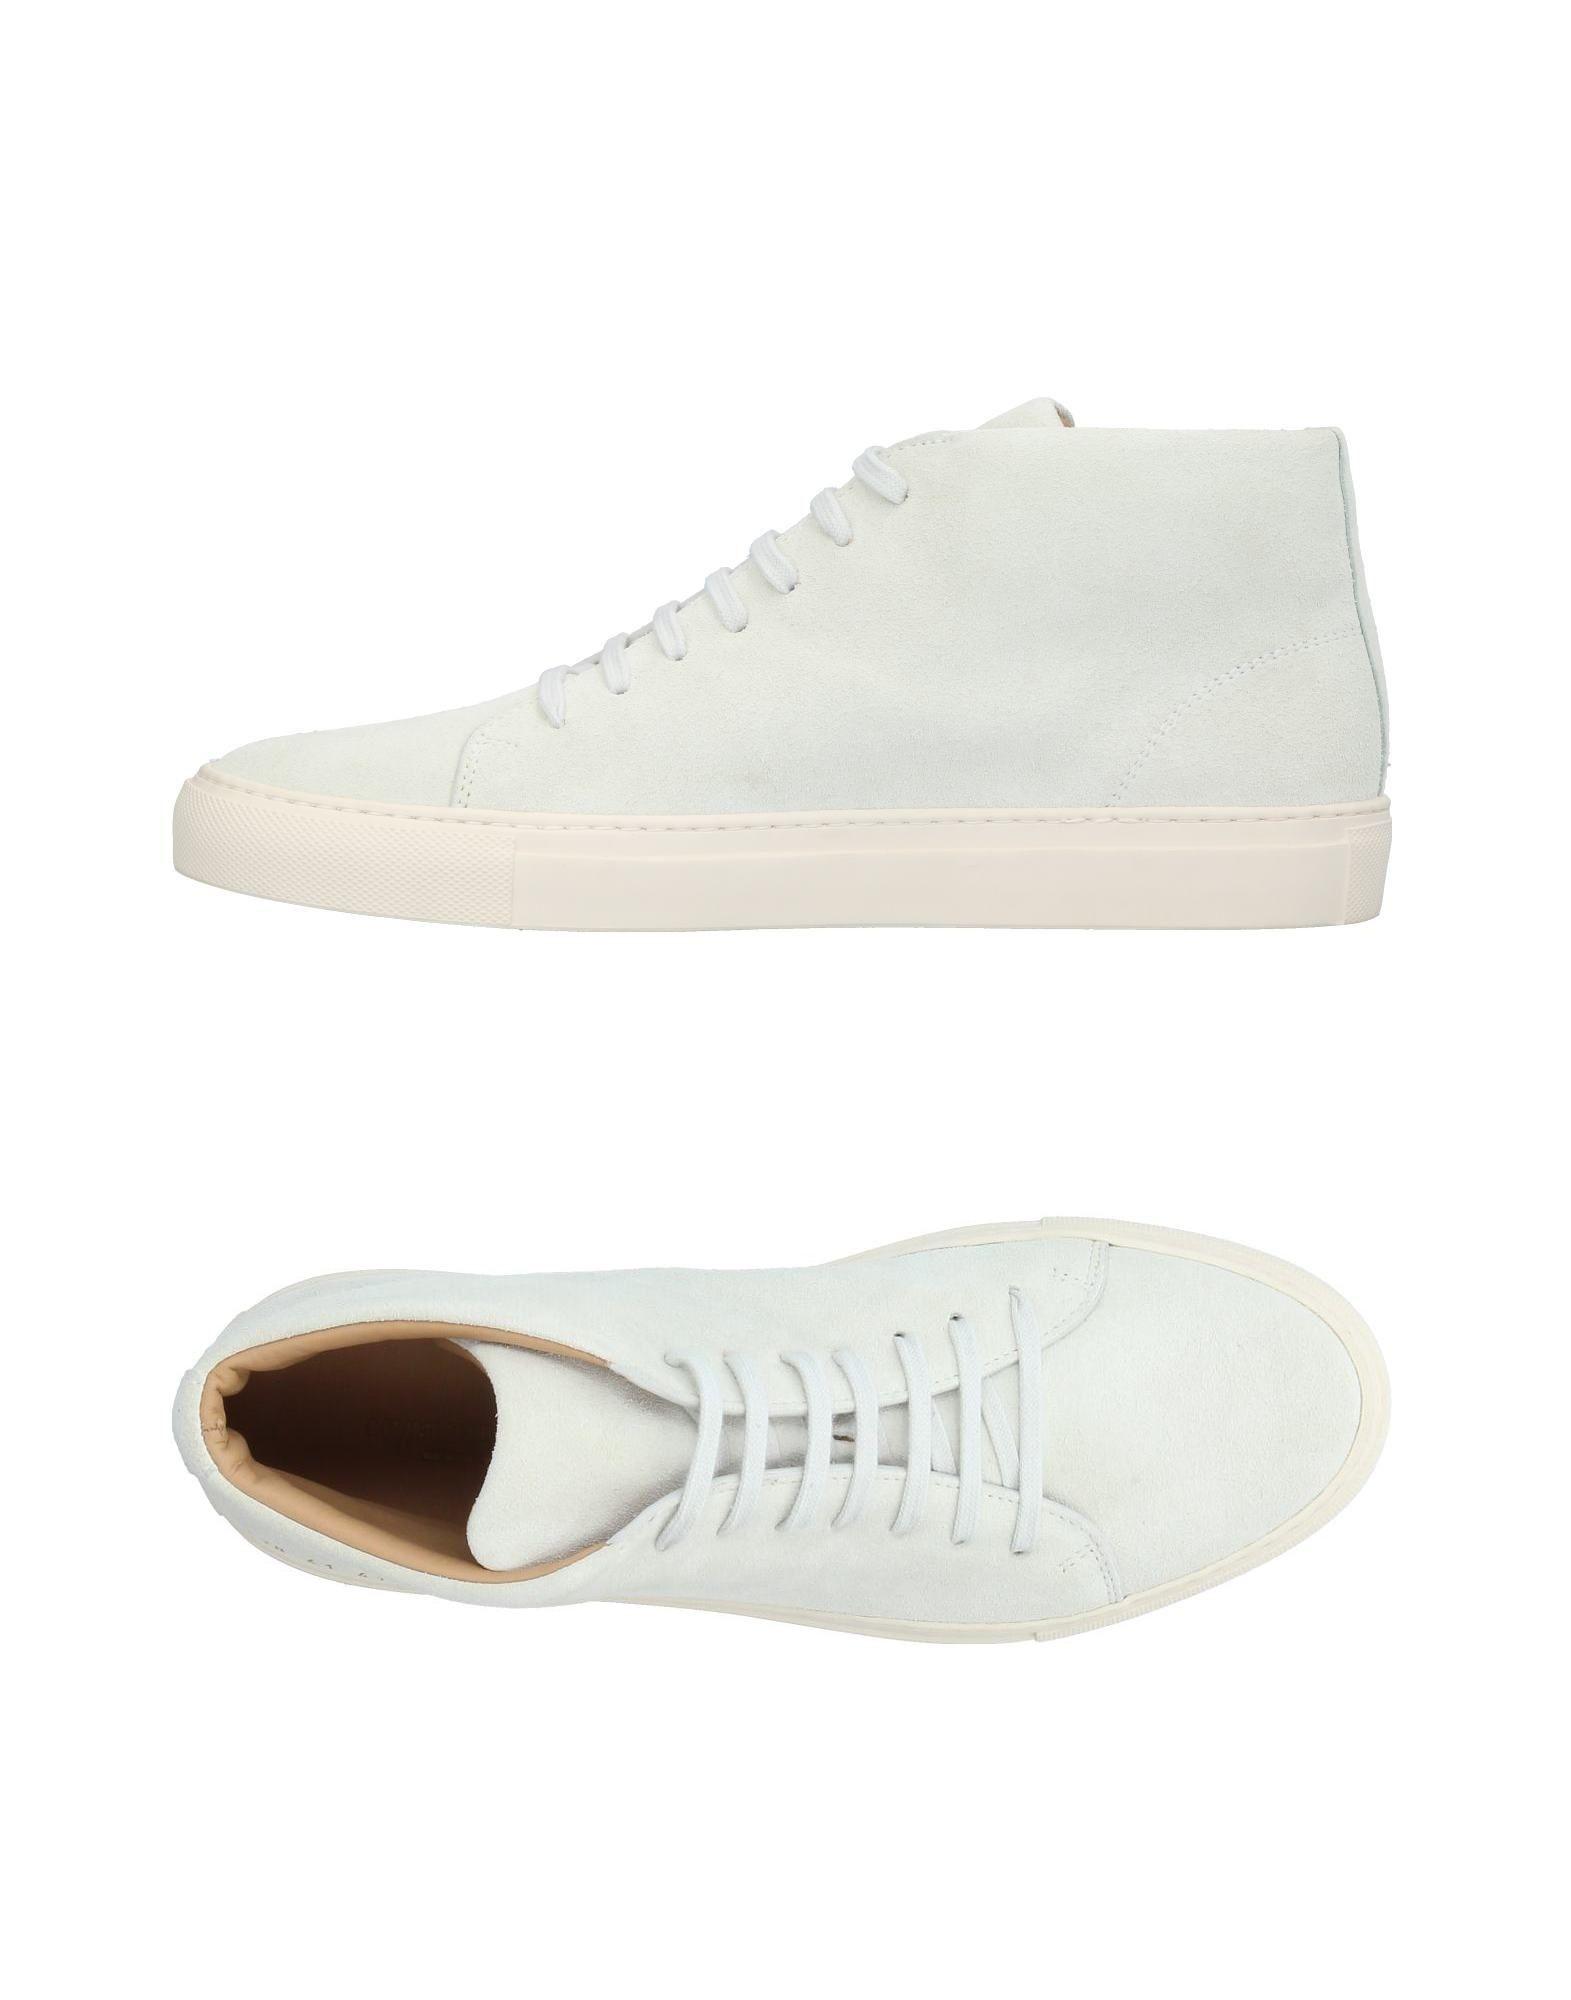 woman by common projects полусапоги и высокие ботинки COMMON PROJECTS Высокие кеды и кроссовки